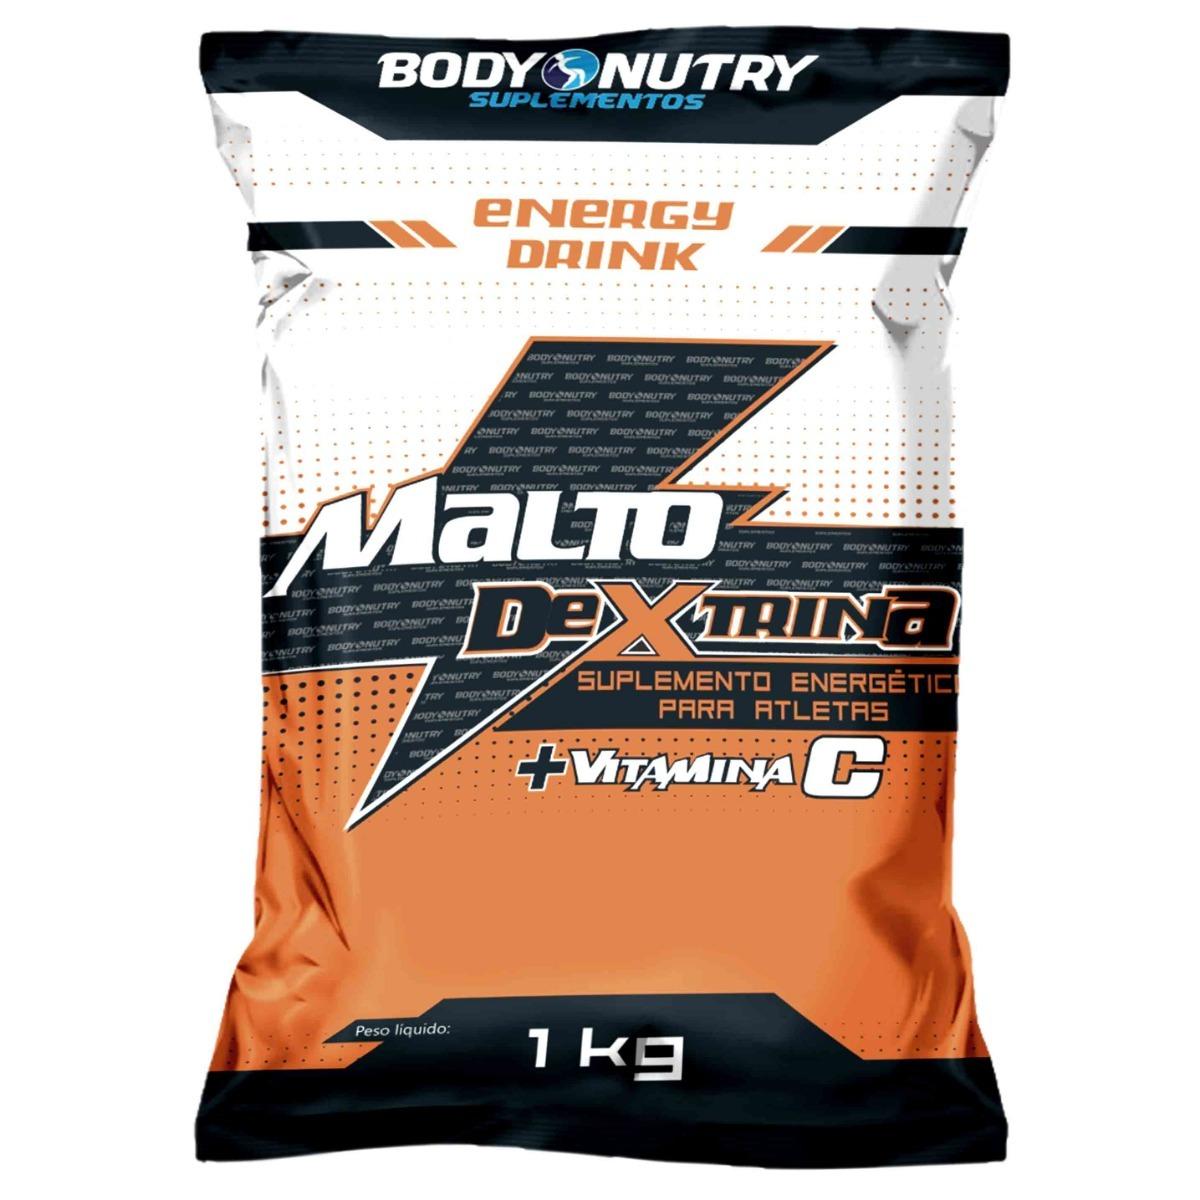 46ccf27c0 kit bcaa + maltodextrina com vitamina c + pre treino combat. Carregando  zoom.